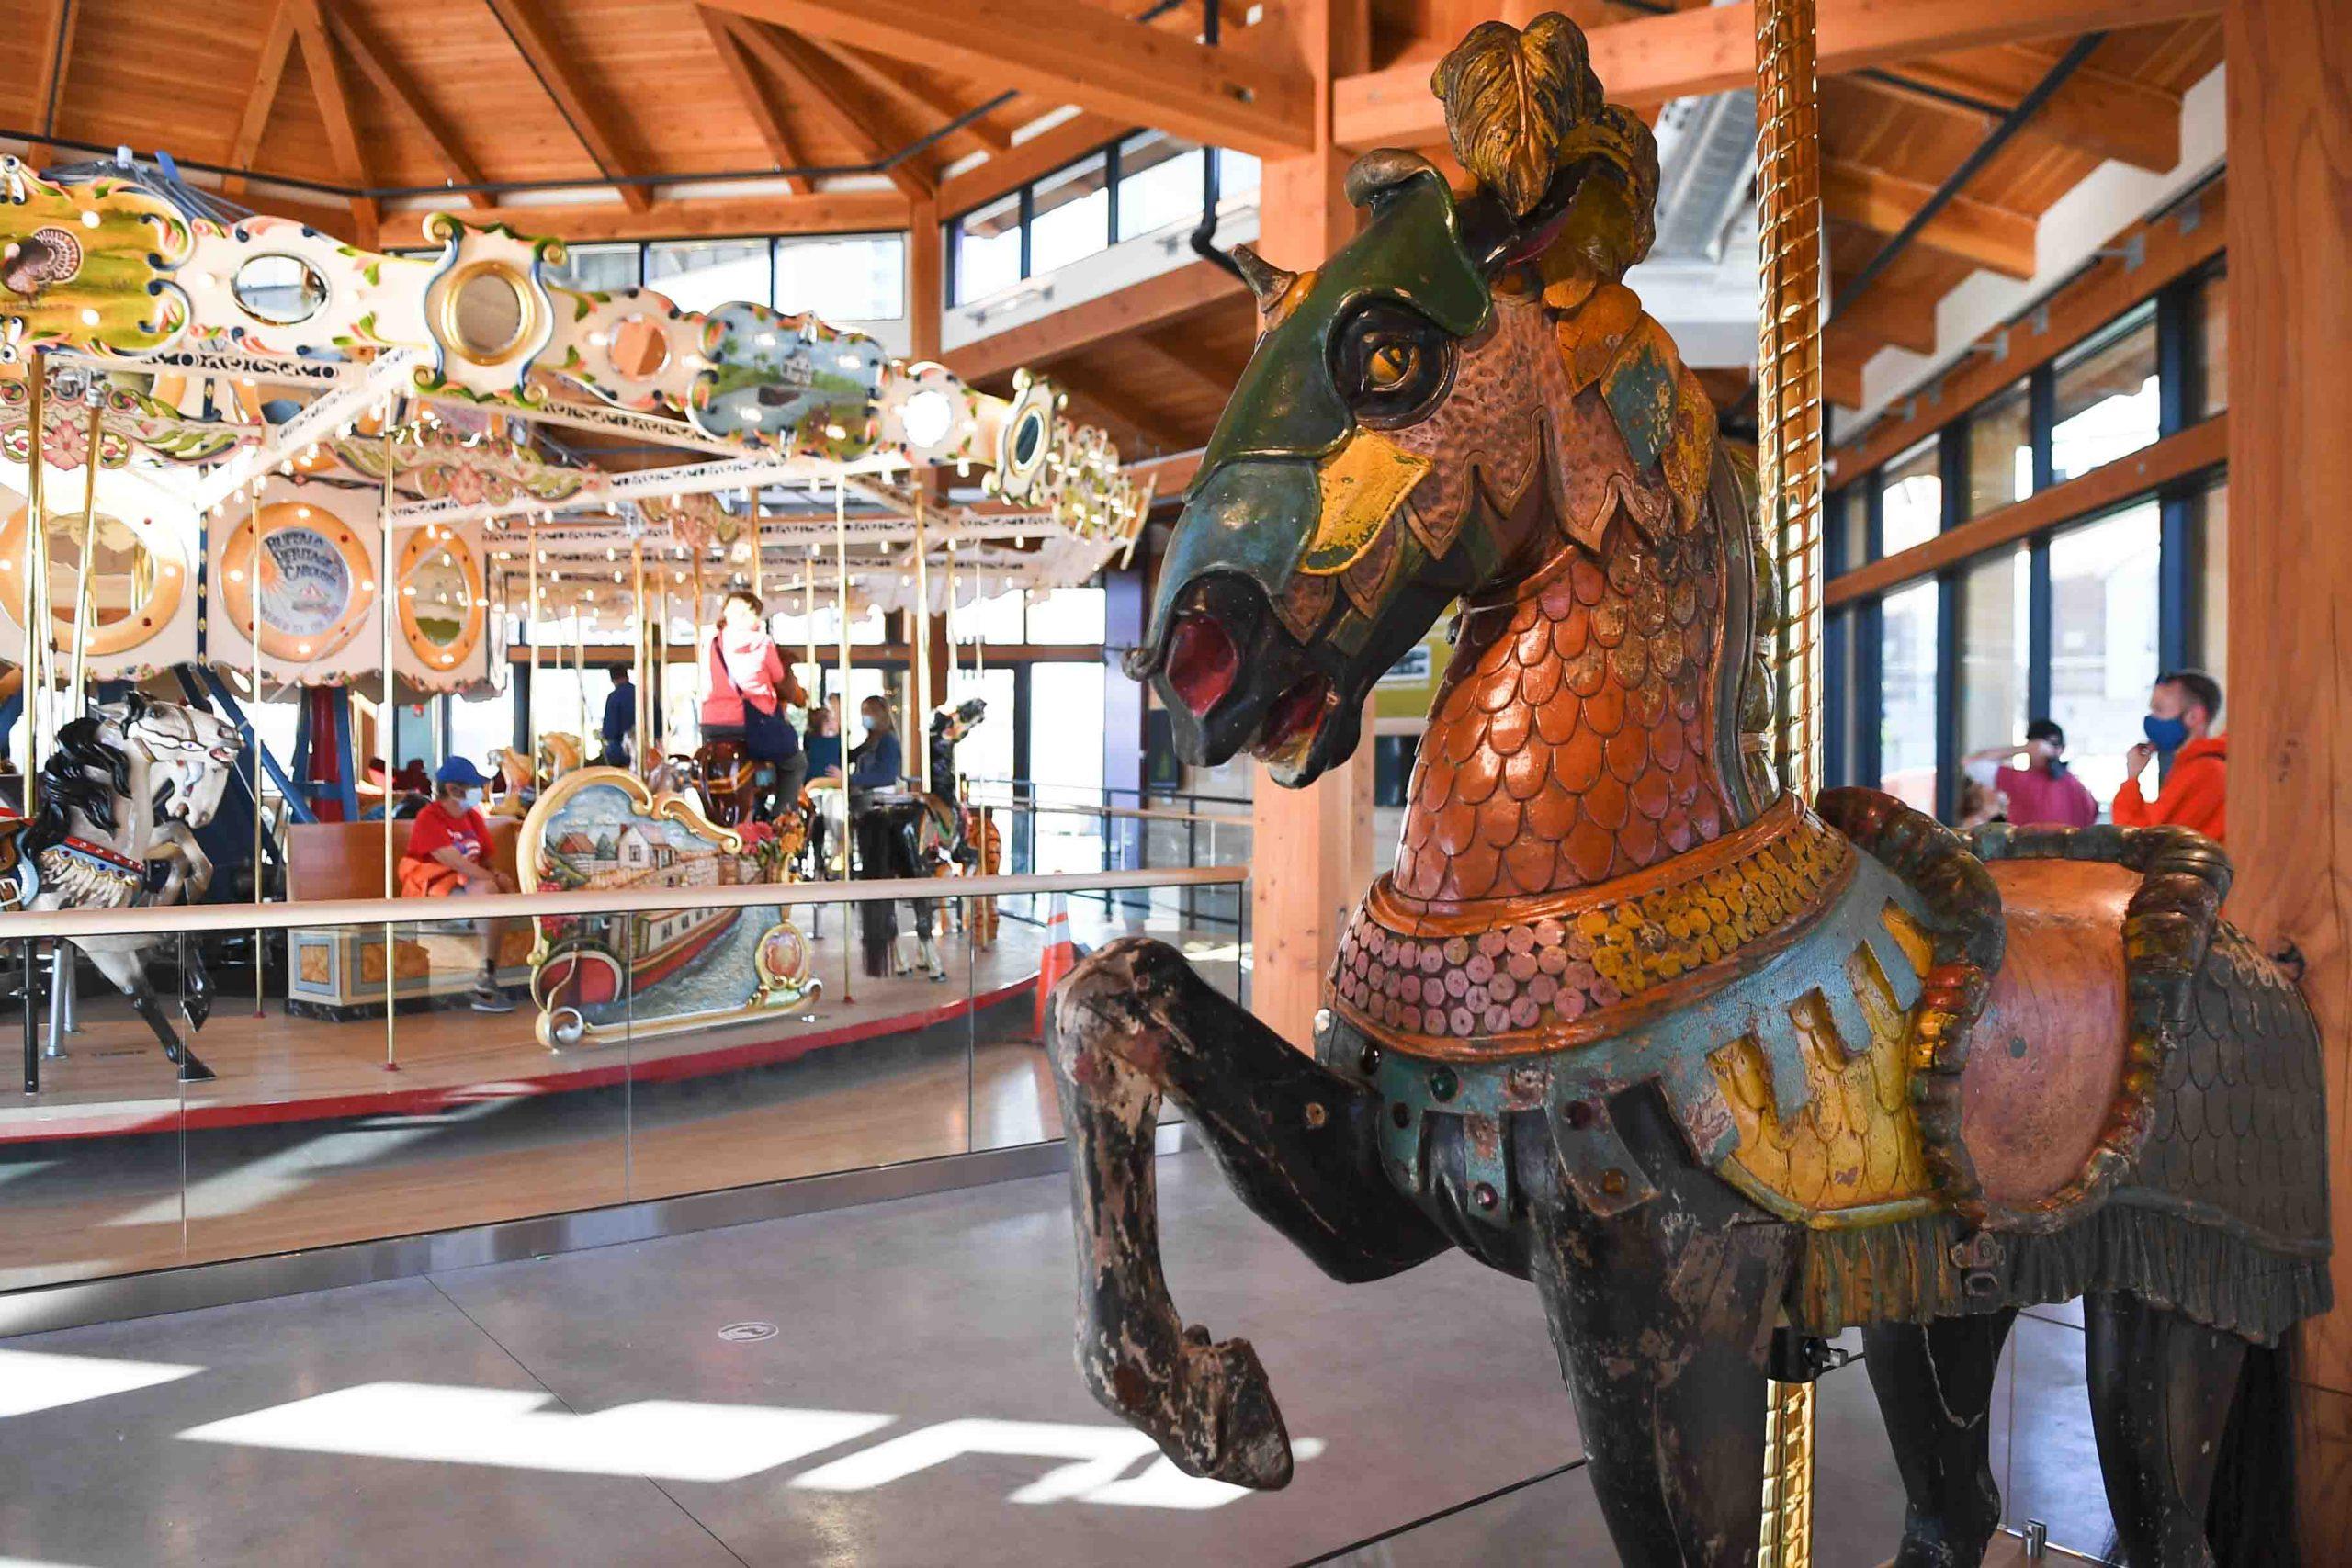 VBN_Buffalo Heritage Carousel_5.30.21_NancyJParisi_6630-reduced